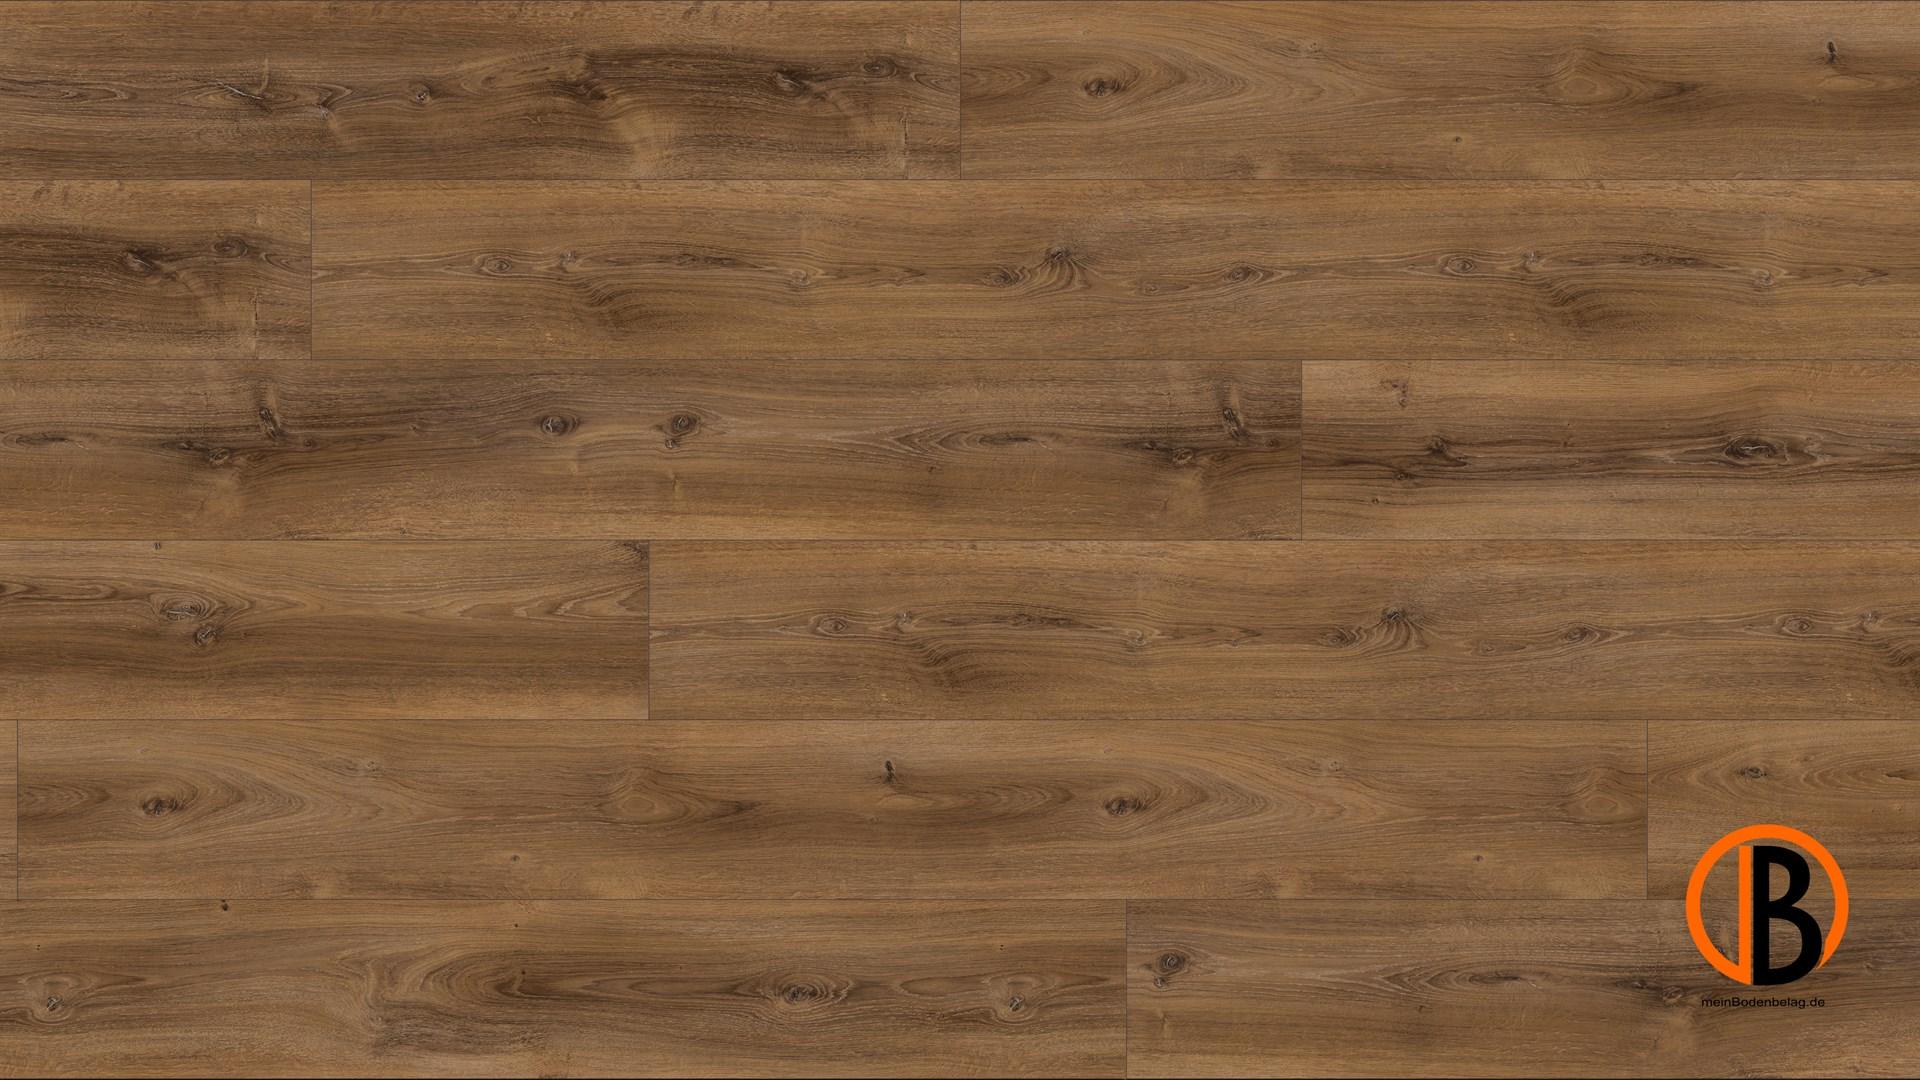 parador laminat basic 600 schlossdiele eiche montana gek lkt naturstruktur lhd minifase. Black Bedroom Furniture Sets. Home Design Ideas